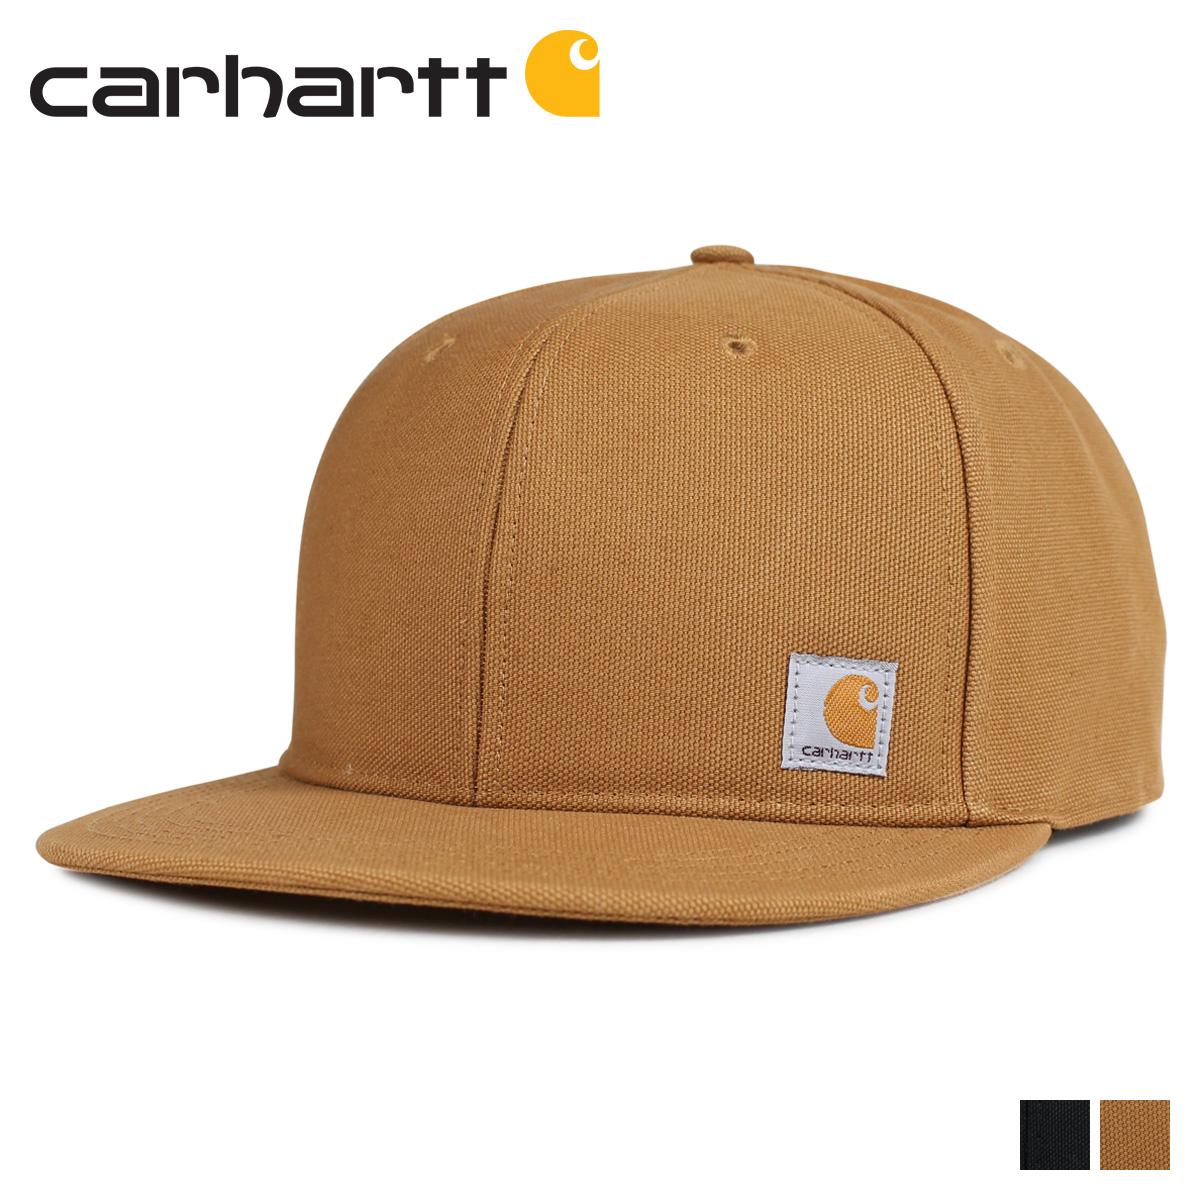 e59f77b85 carhartt ASHLAND CAP car heart cap hat men gap Dis snapback black brown  black 101604